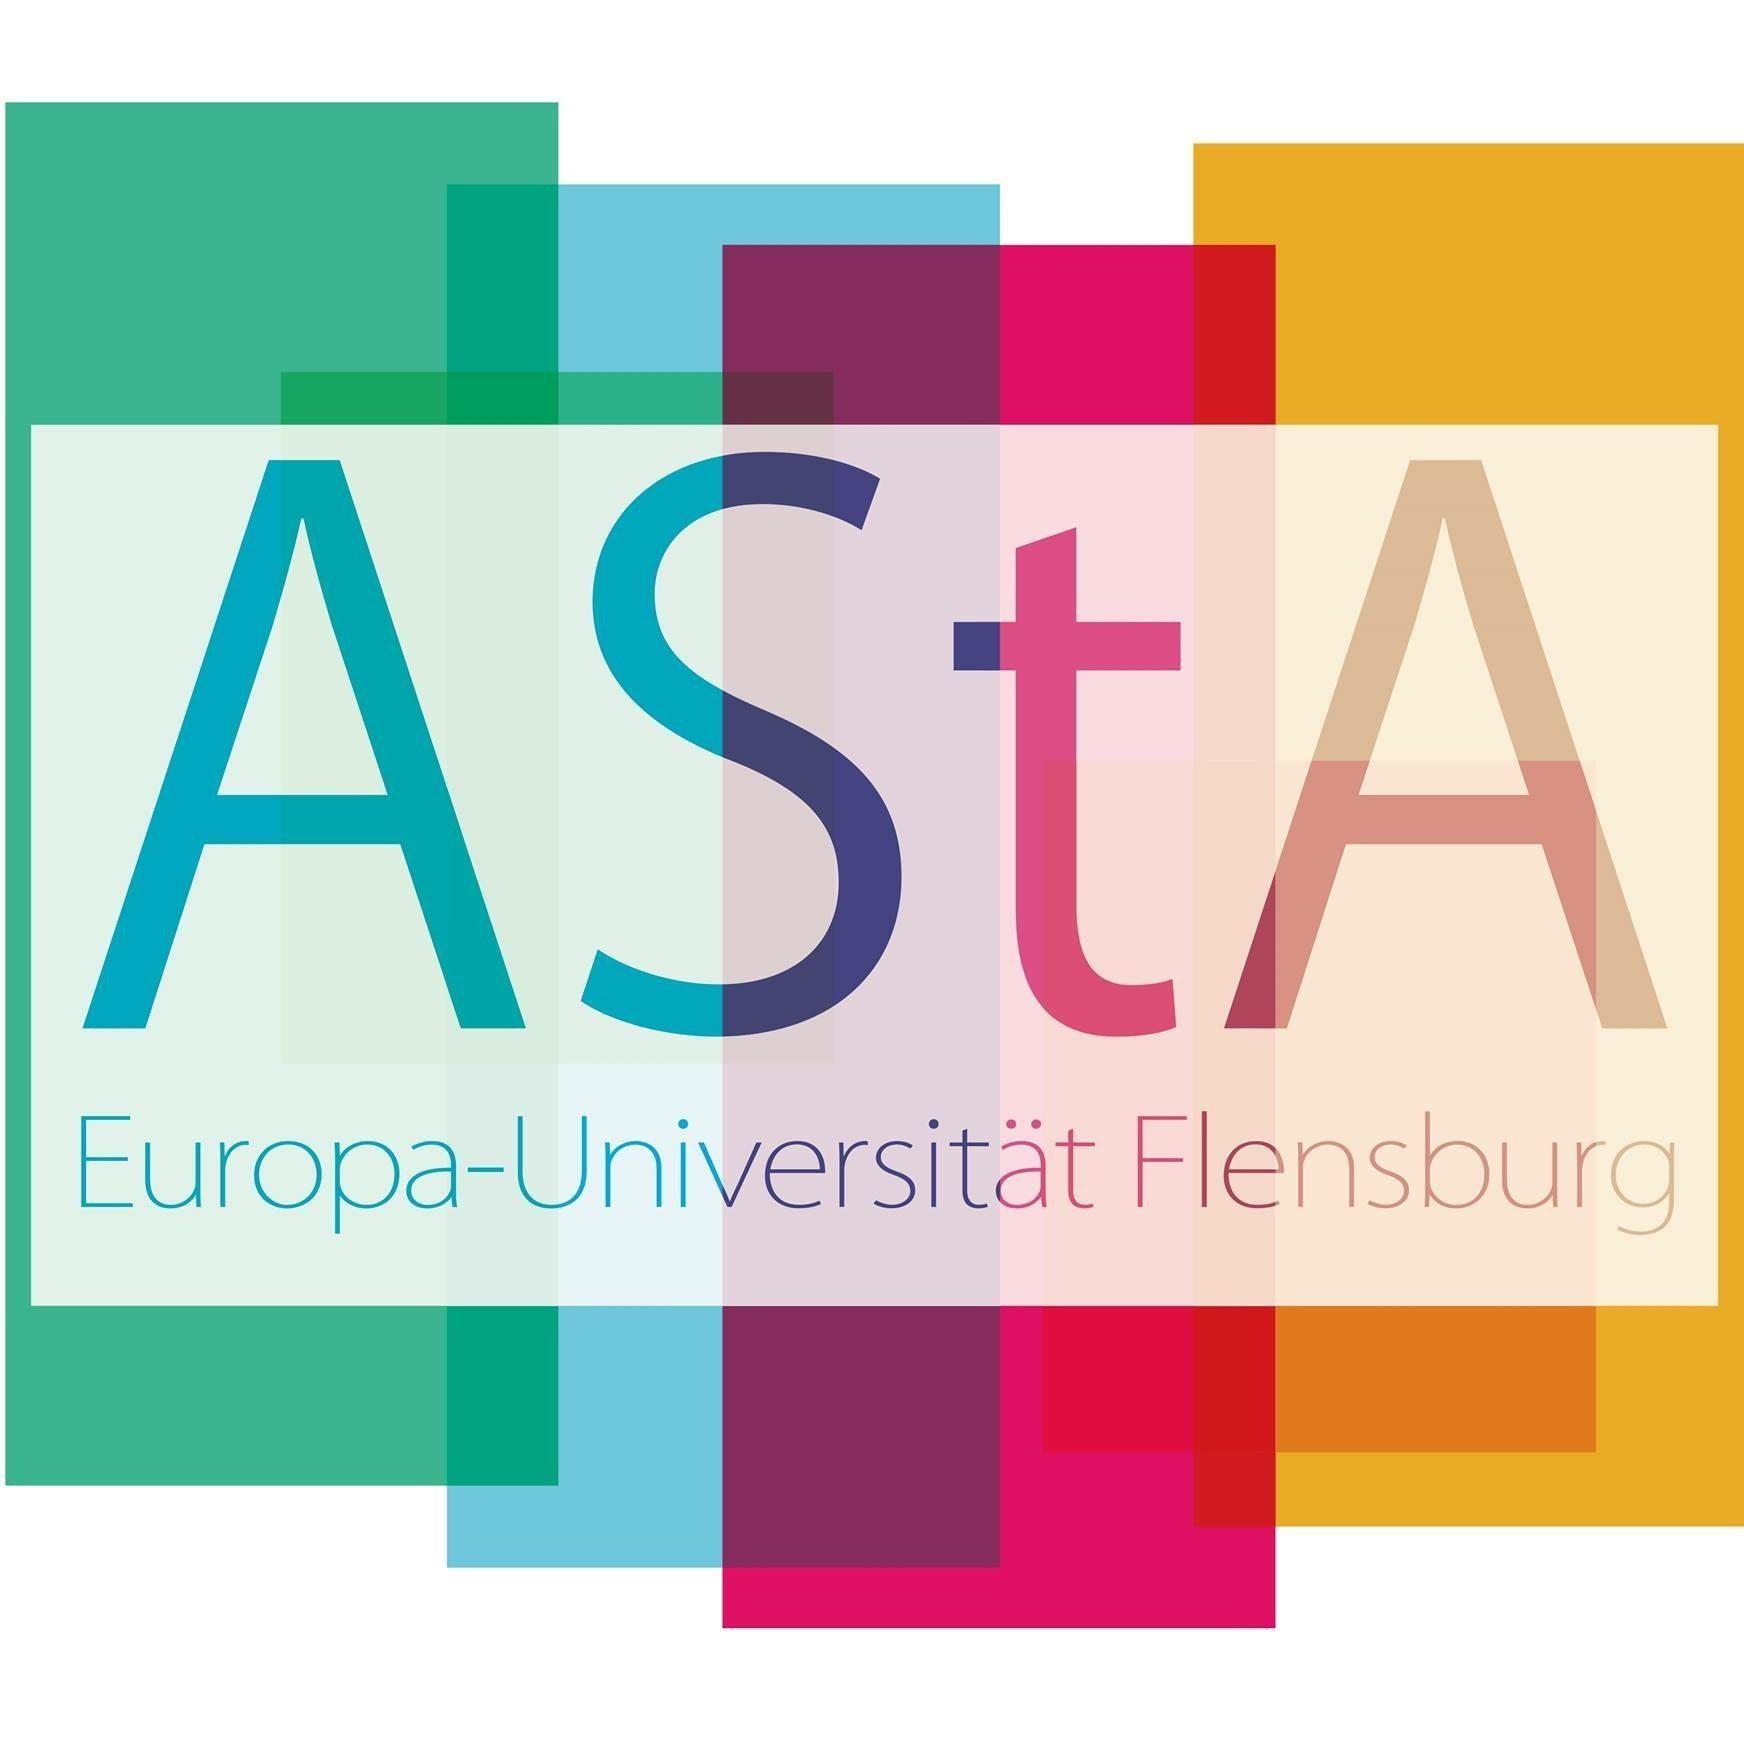 AStA Europa-Universität Flensburg